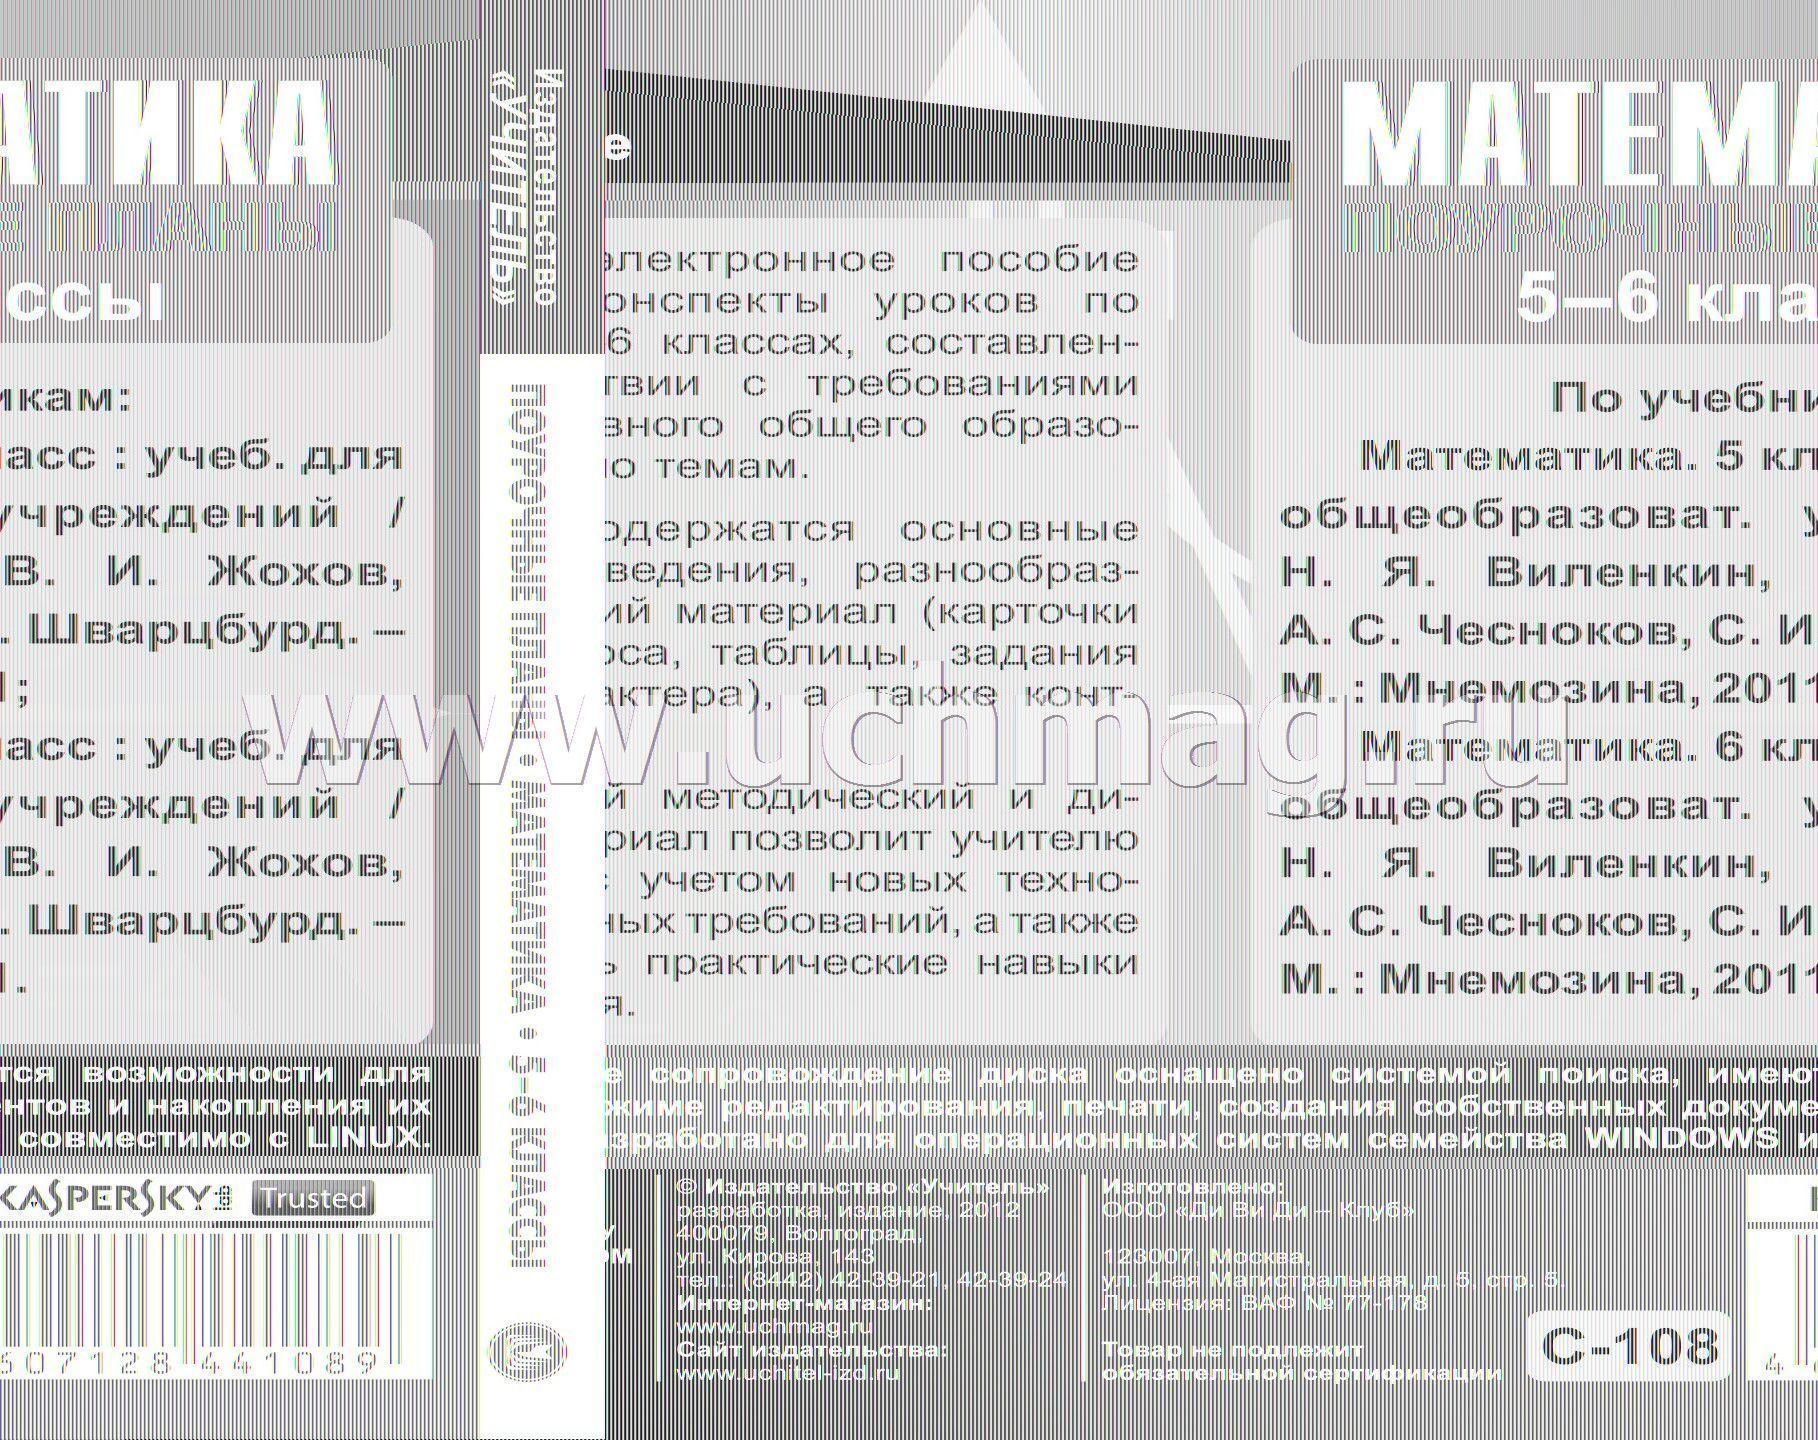 Решебник по Математике 5 Класса Виноградова